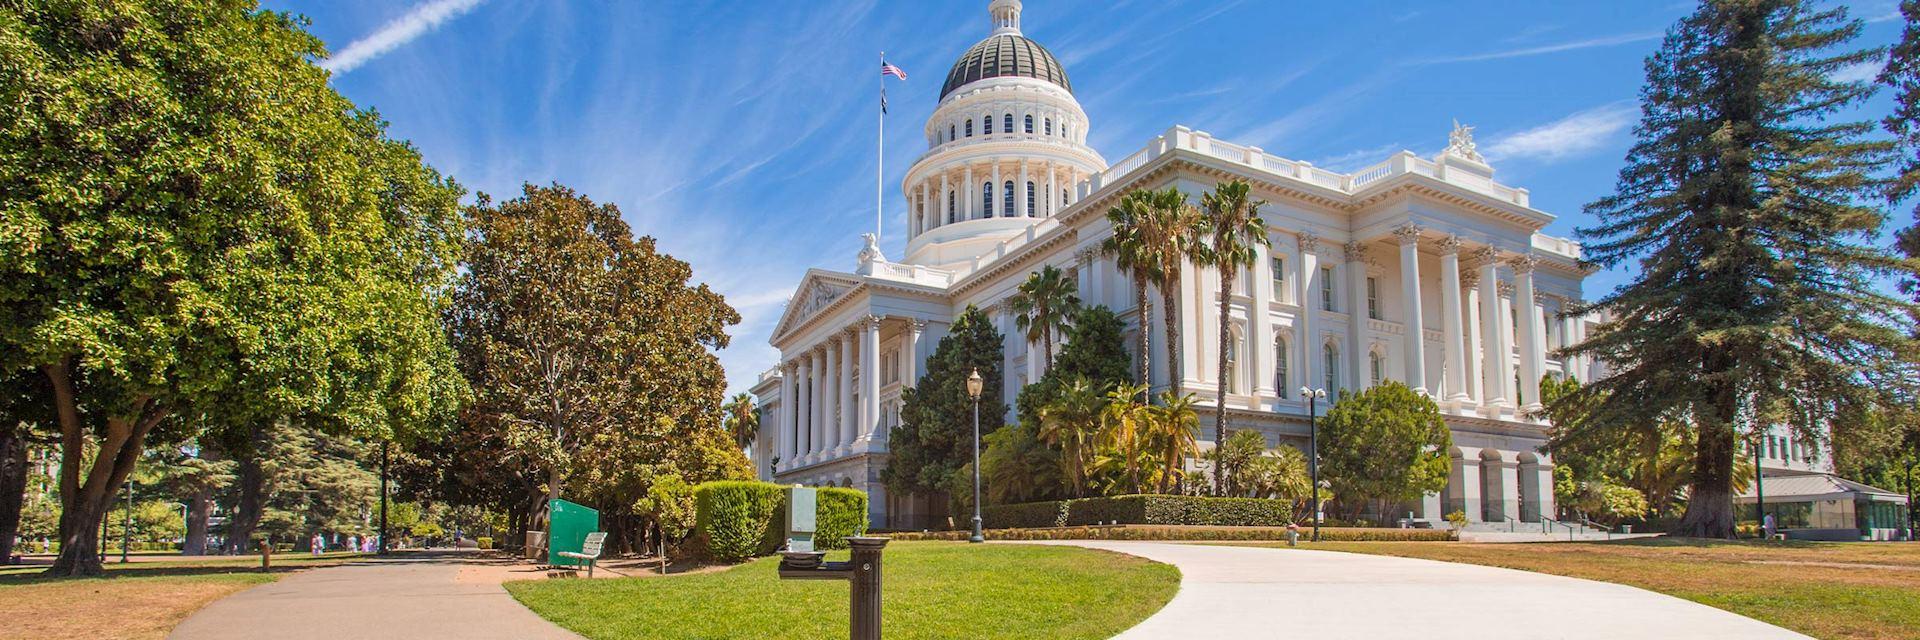 California Capital Building, Sacramento